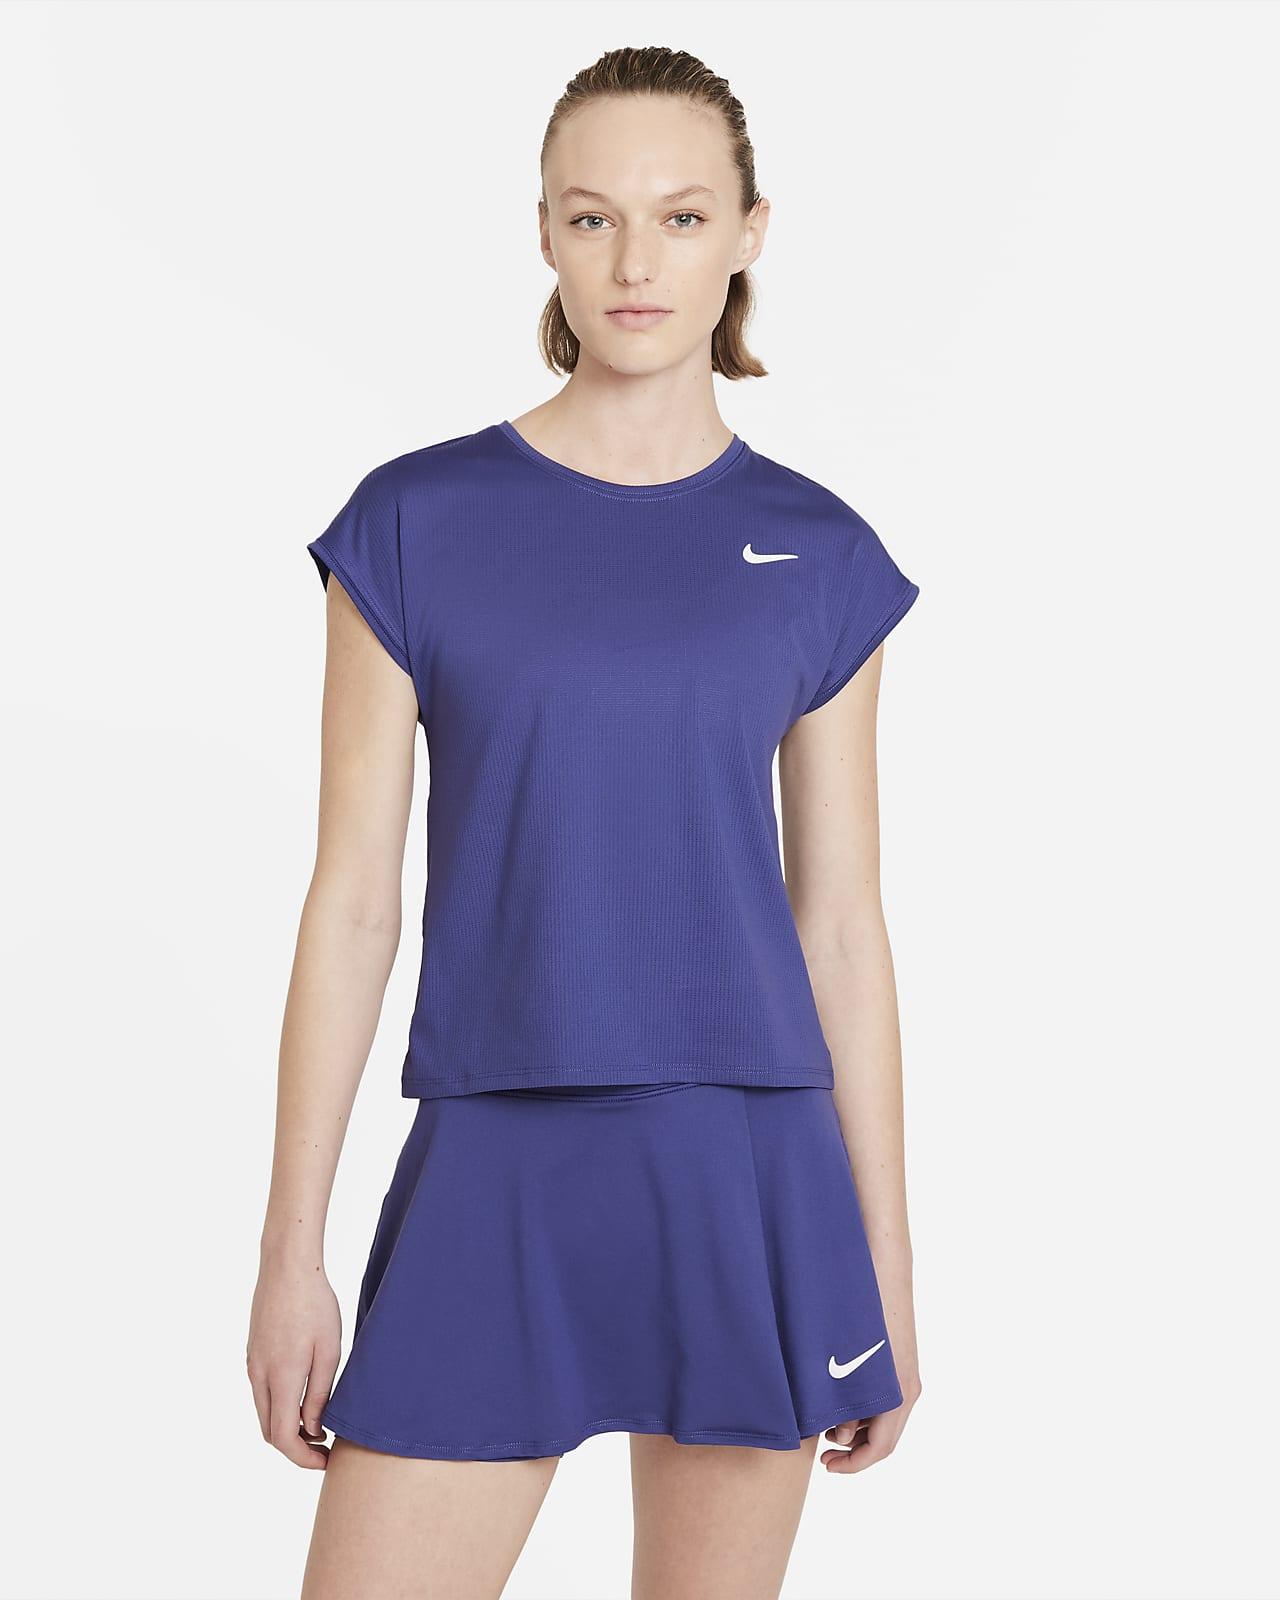 Kortärmad tenniströja NikeCourt Dri-FIT Victory för kvinnor